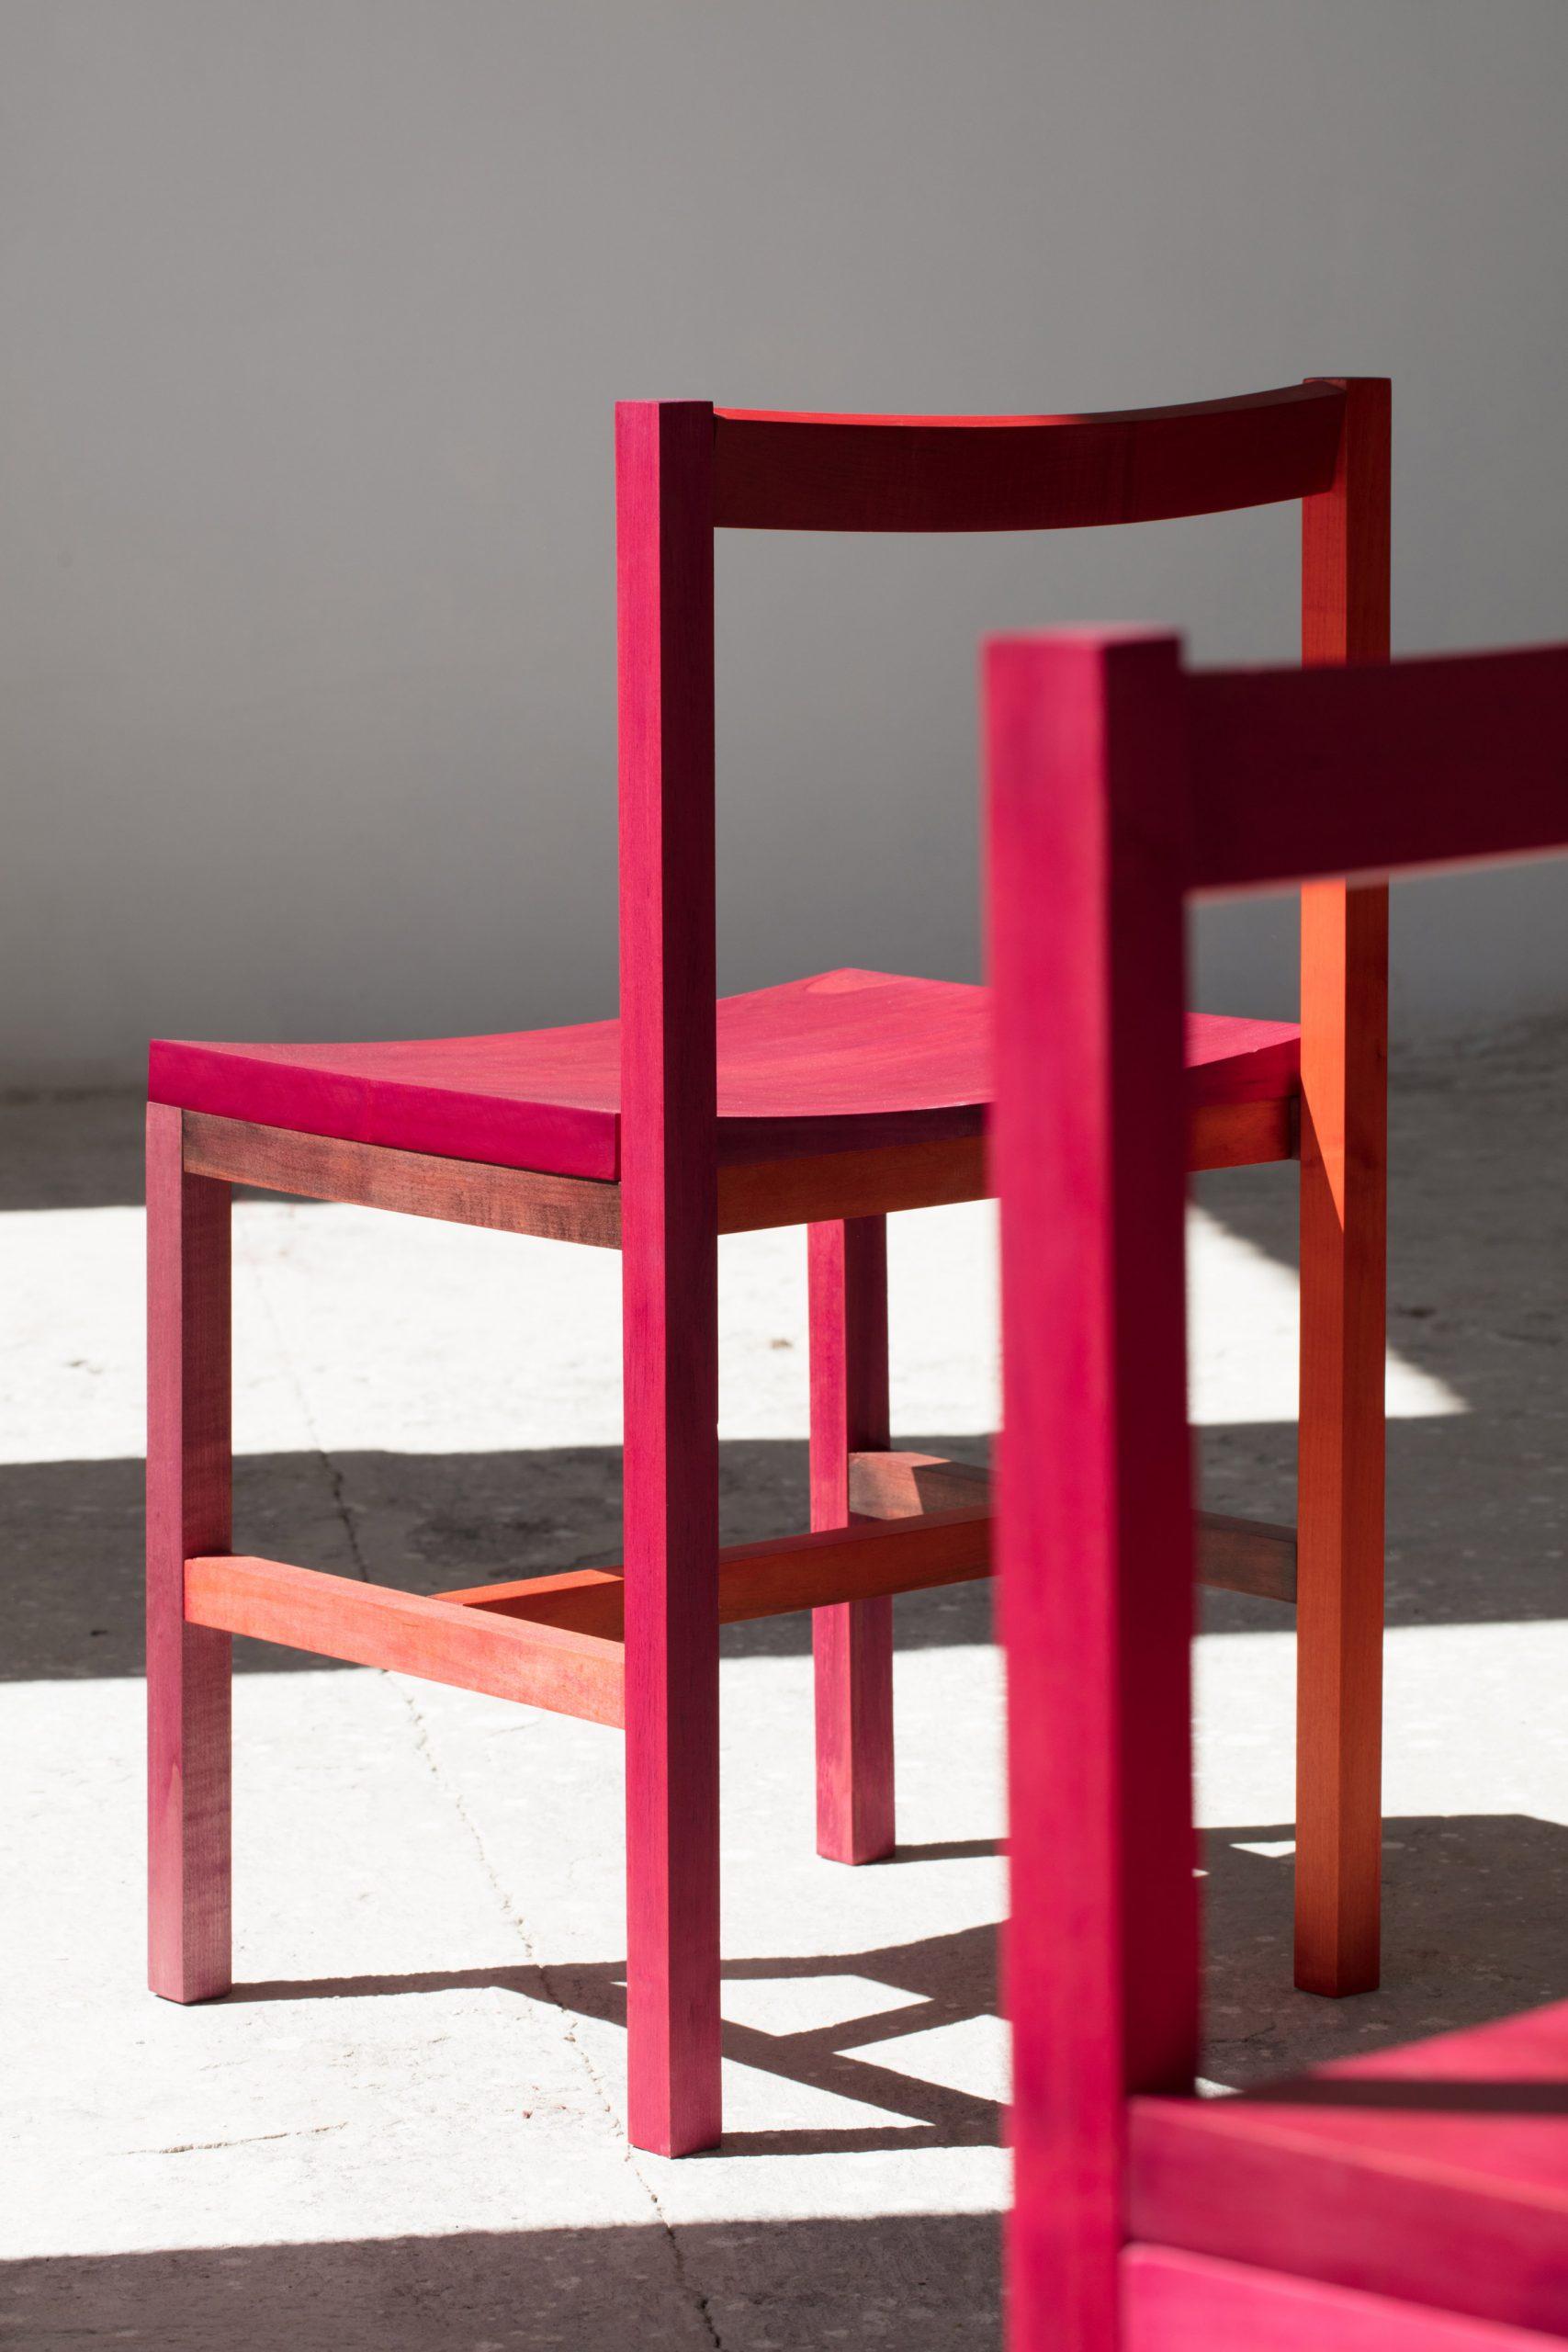 Grana chairs by Moisés Hernández